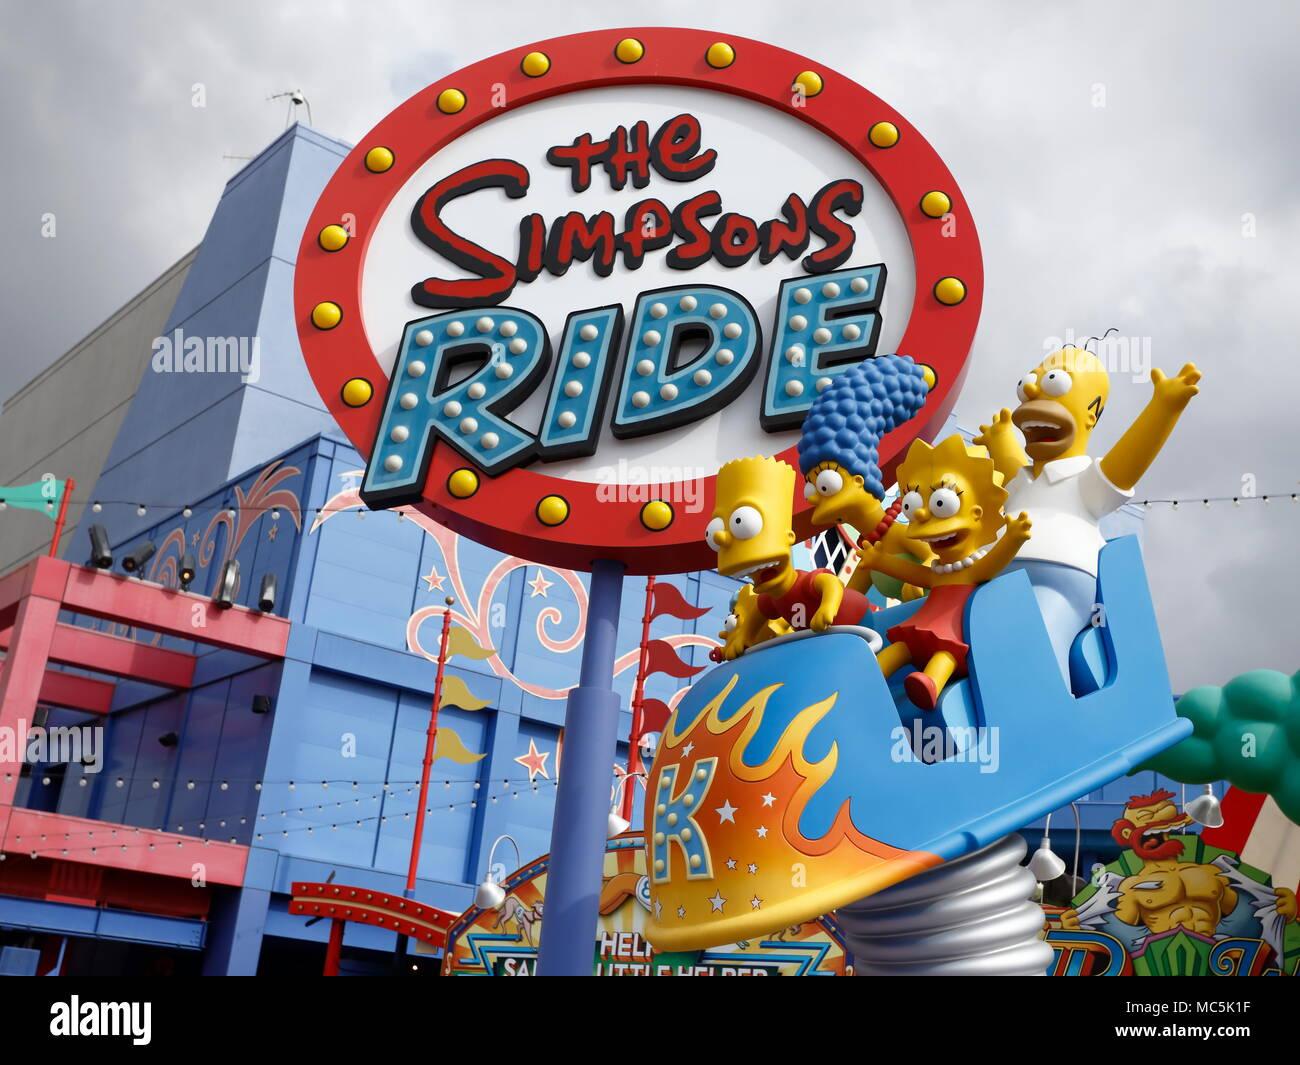 The Simpsons Ride at Universal Studios, California - Stock Image